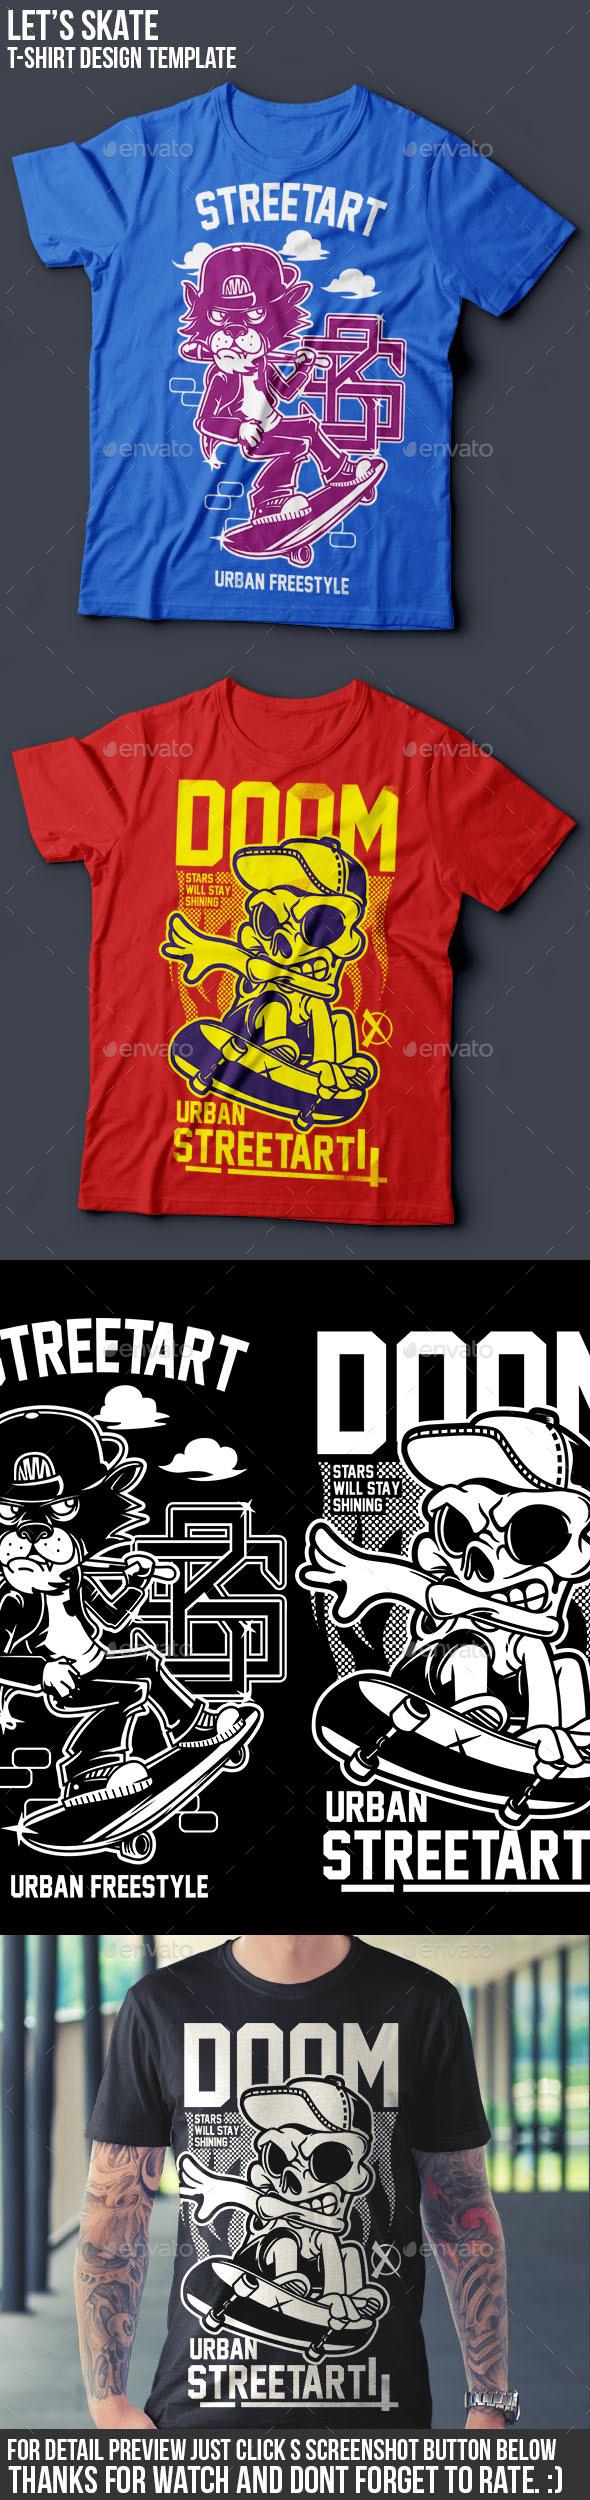 Let's Skate T-Shirt Designs - Sports & Teams T-Shirts